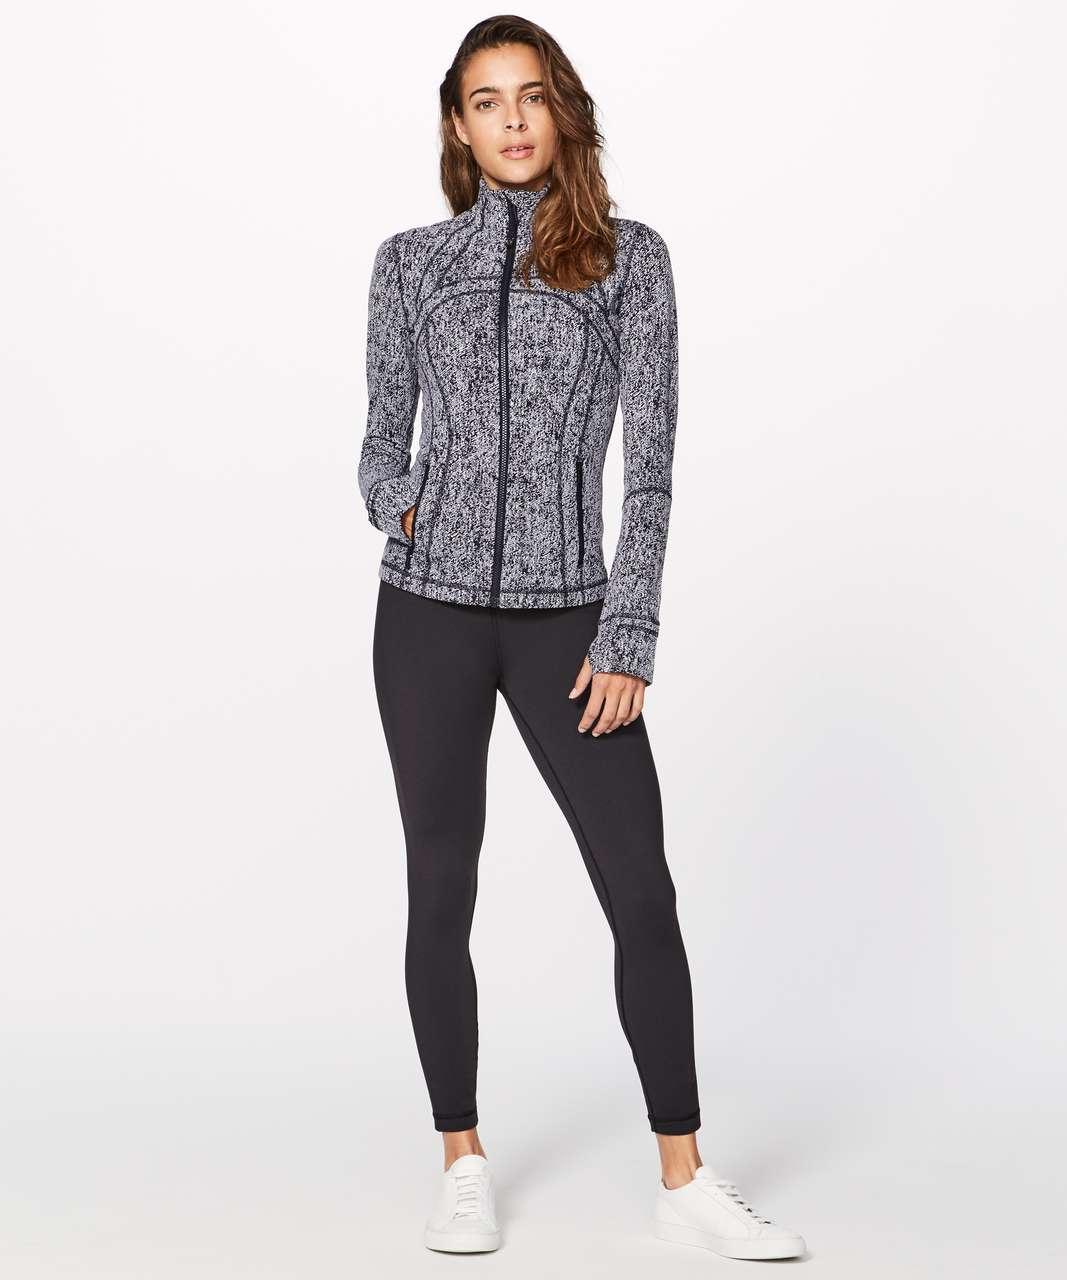 Lululemon Define Jacket - Luon Irregular Denim Twill Black White